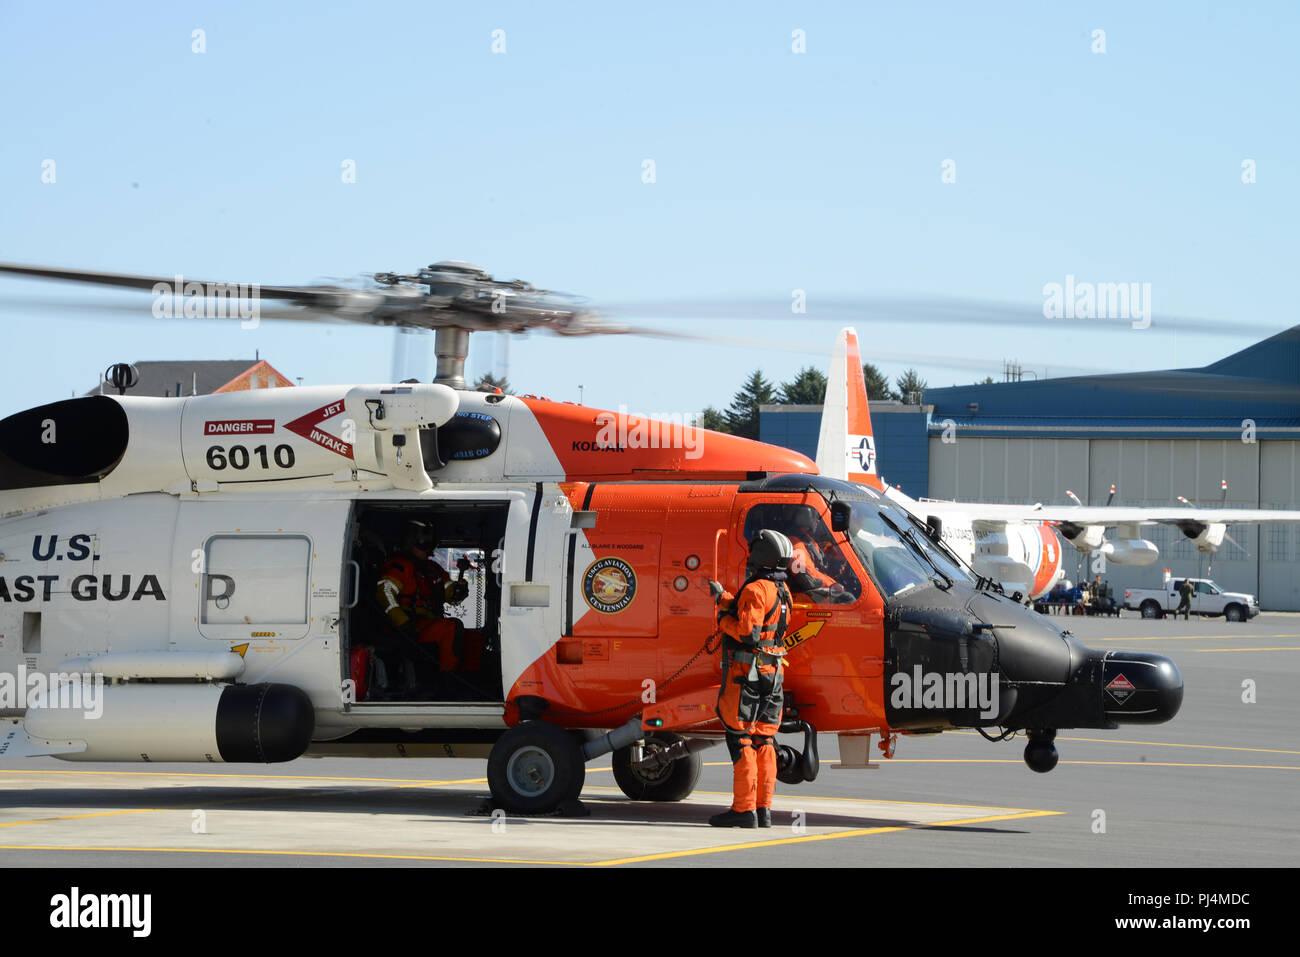 A Coast Guard Air Station Kodiak MH-60 Jayhawk aircrew